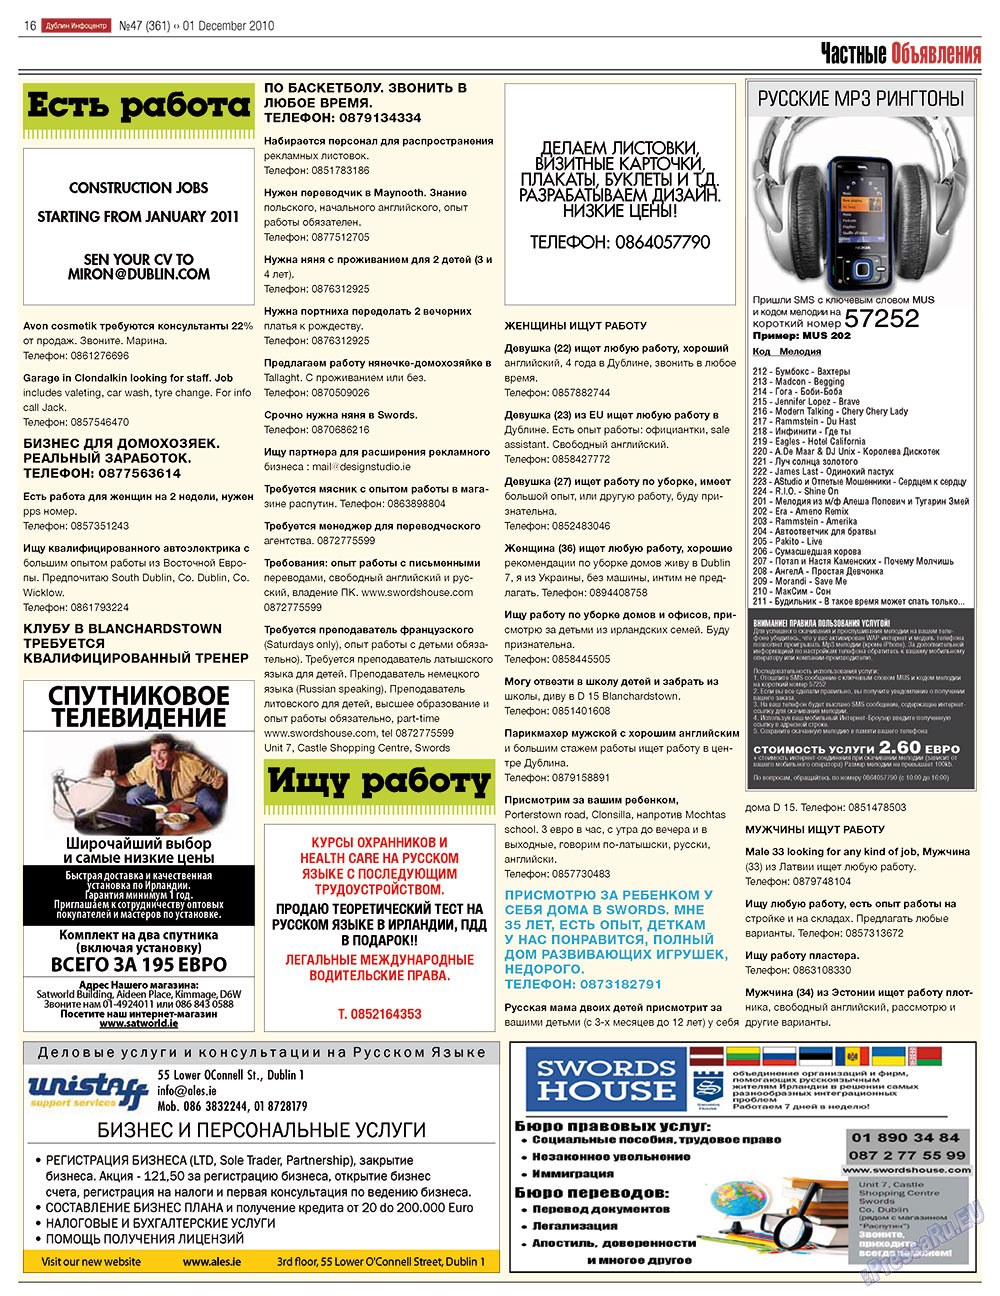 Дублин инфоцентр (газета). 2010 год, номер 47, стр. 16